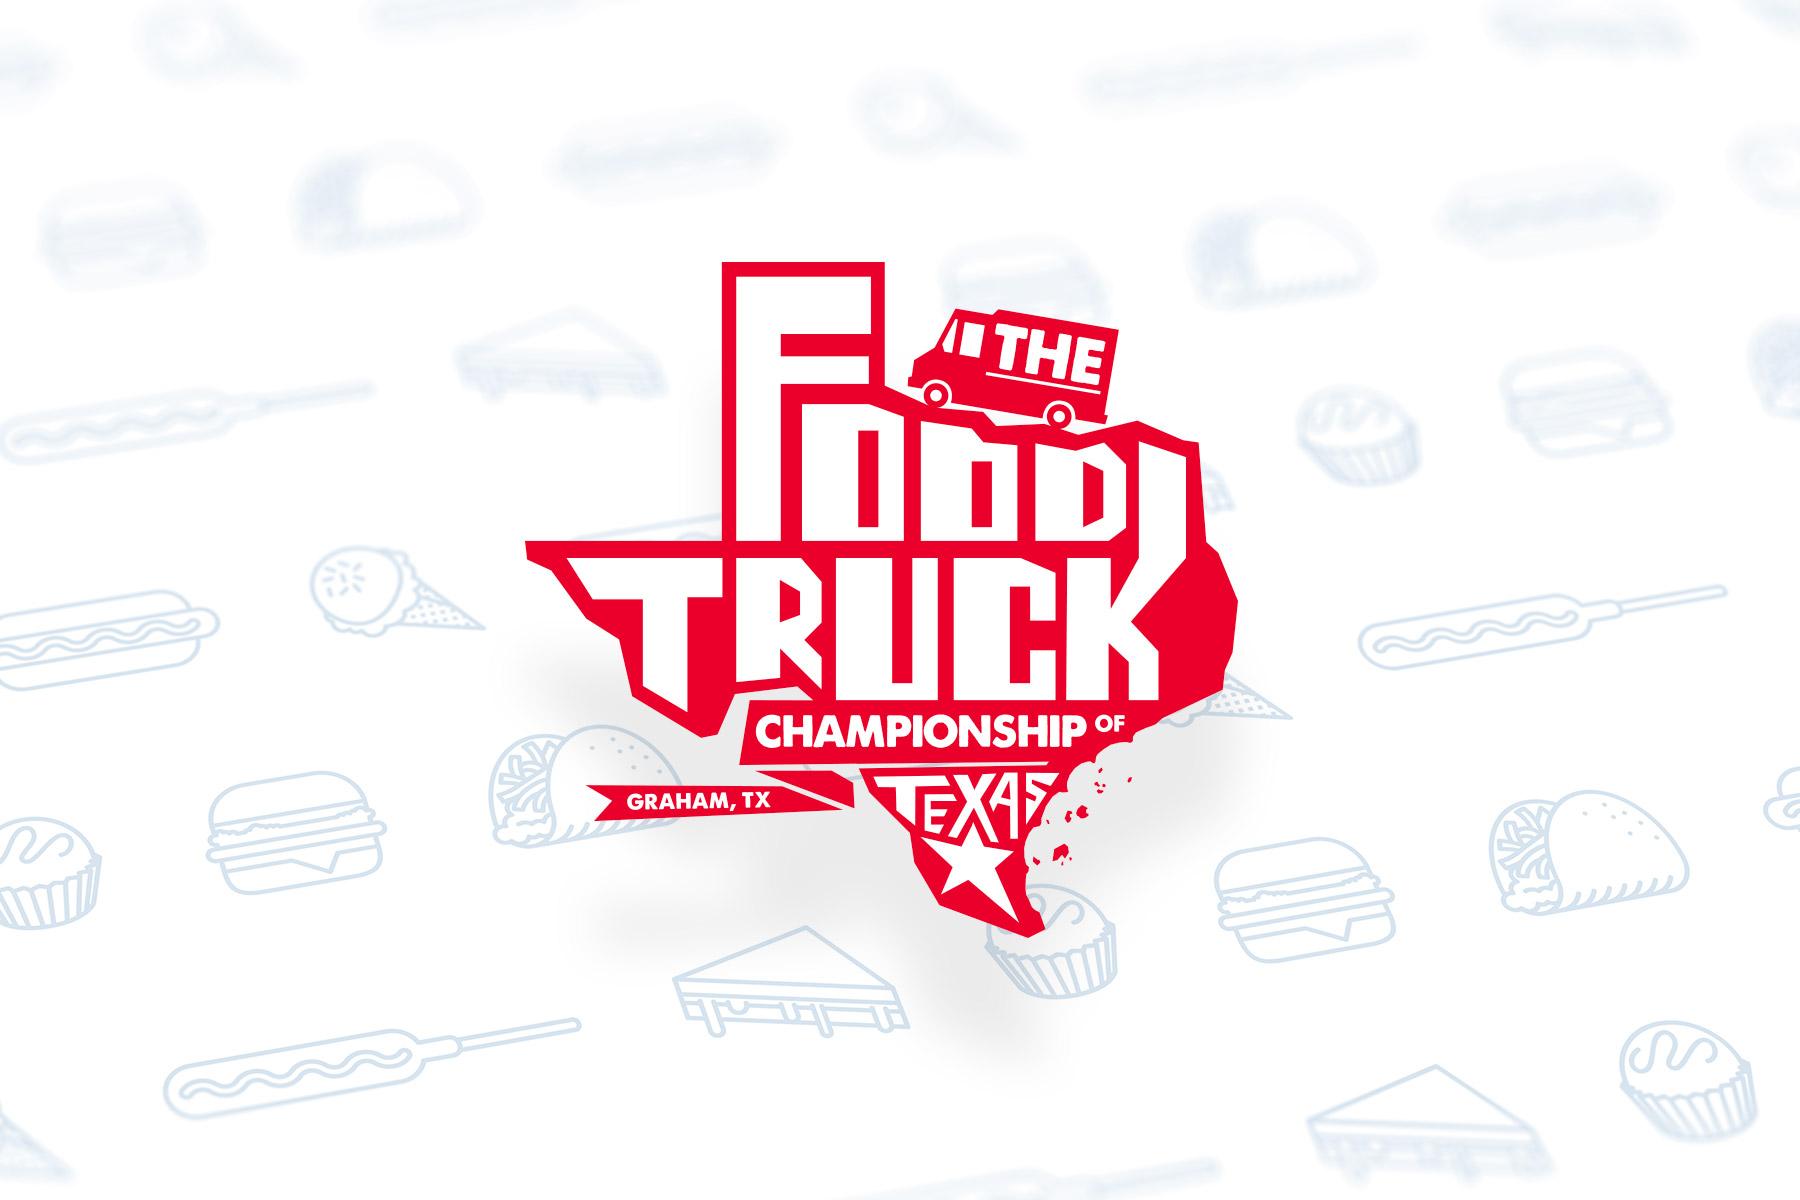 Food Truck Championship of Texas Logo